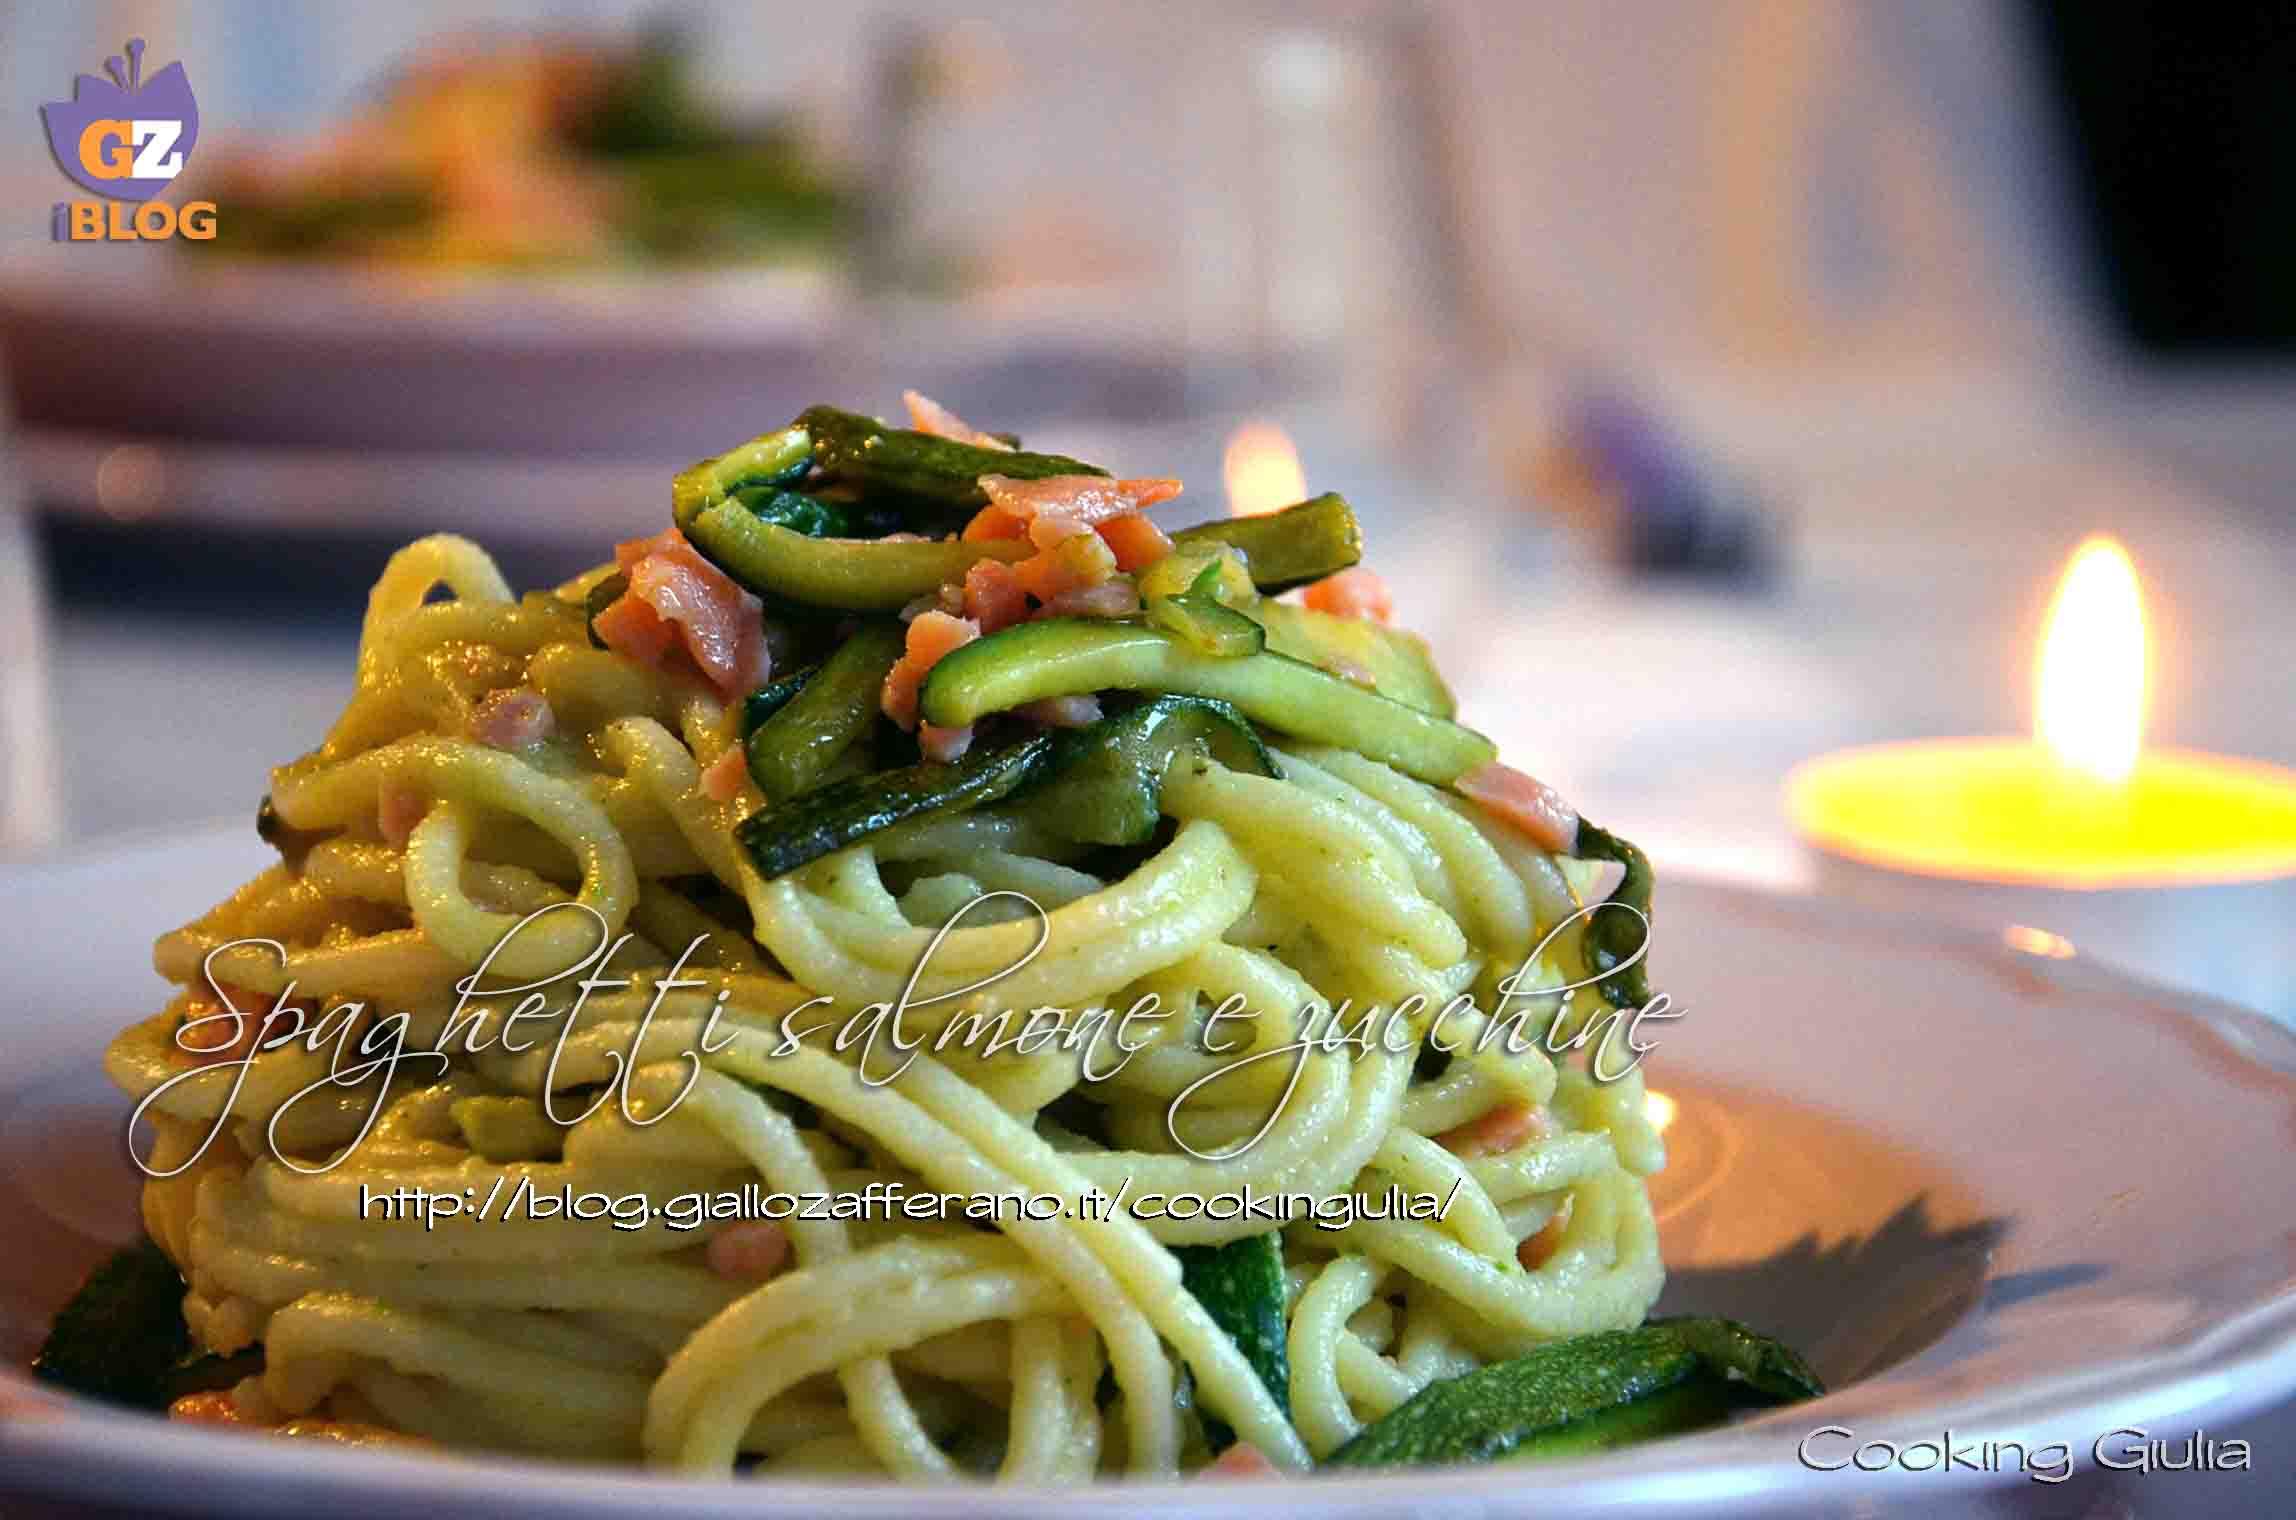 salmone e zucchine, salmone, zucchine, pasta, spaghetti, cooking giulia, salmone affumicato